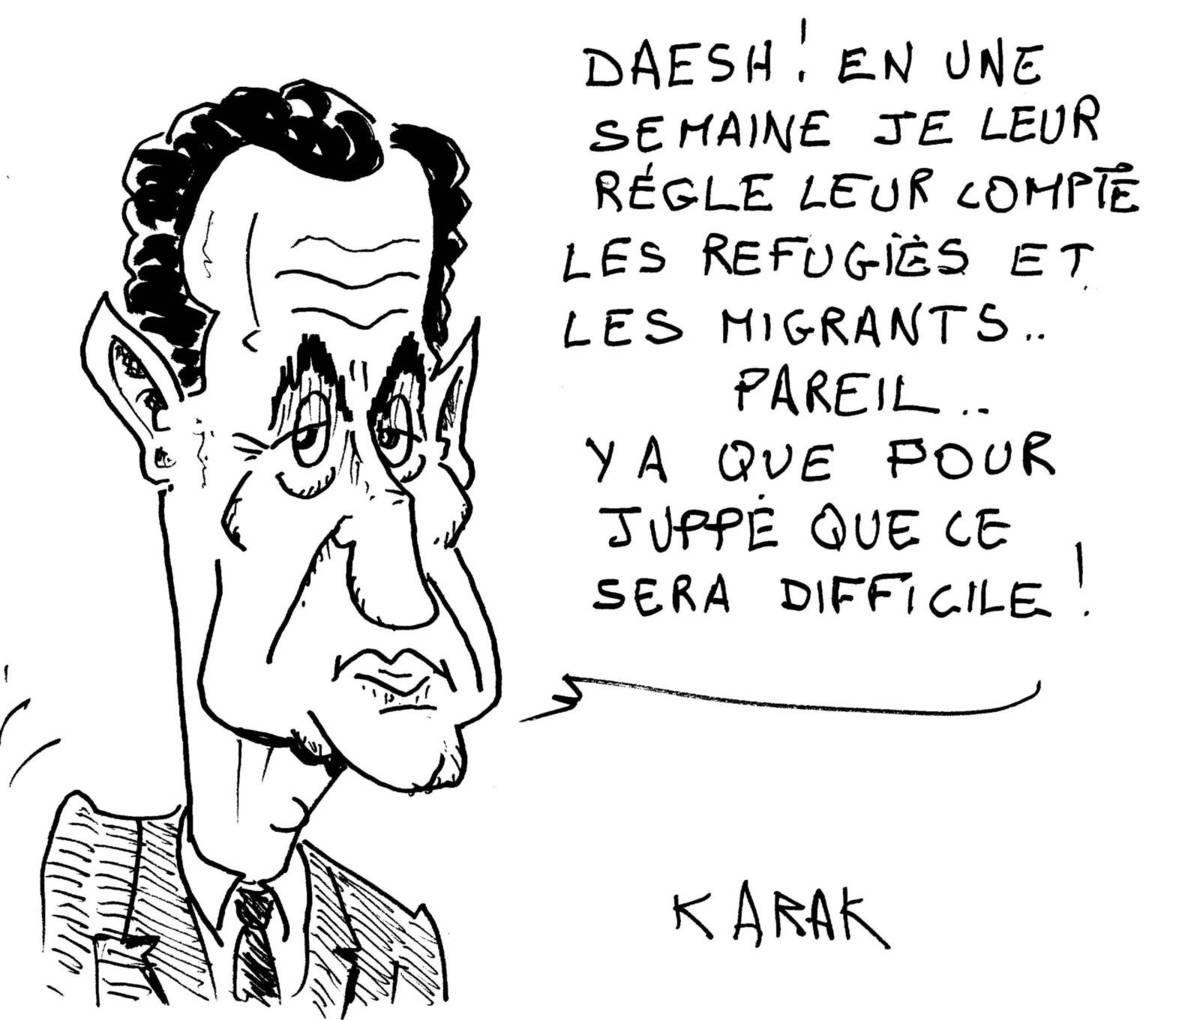 jean Marie Sarkozy